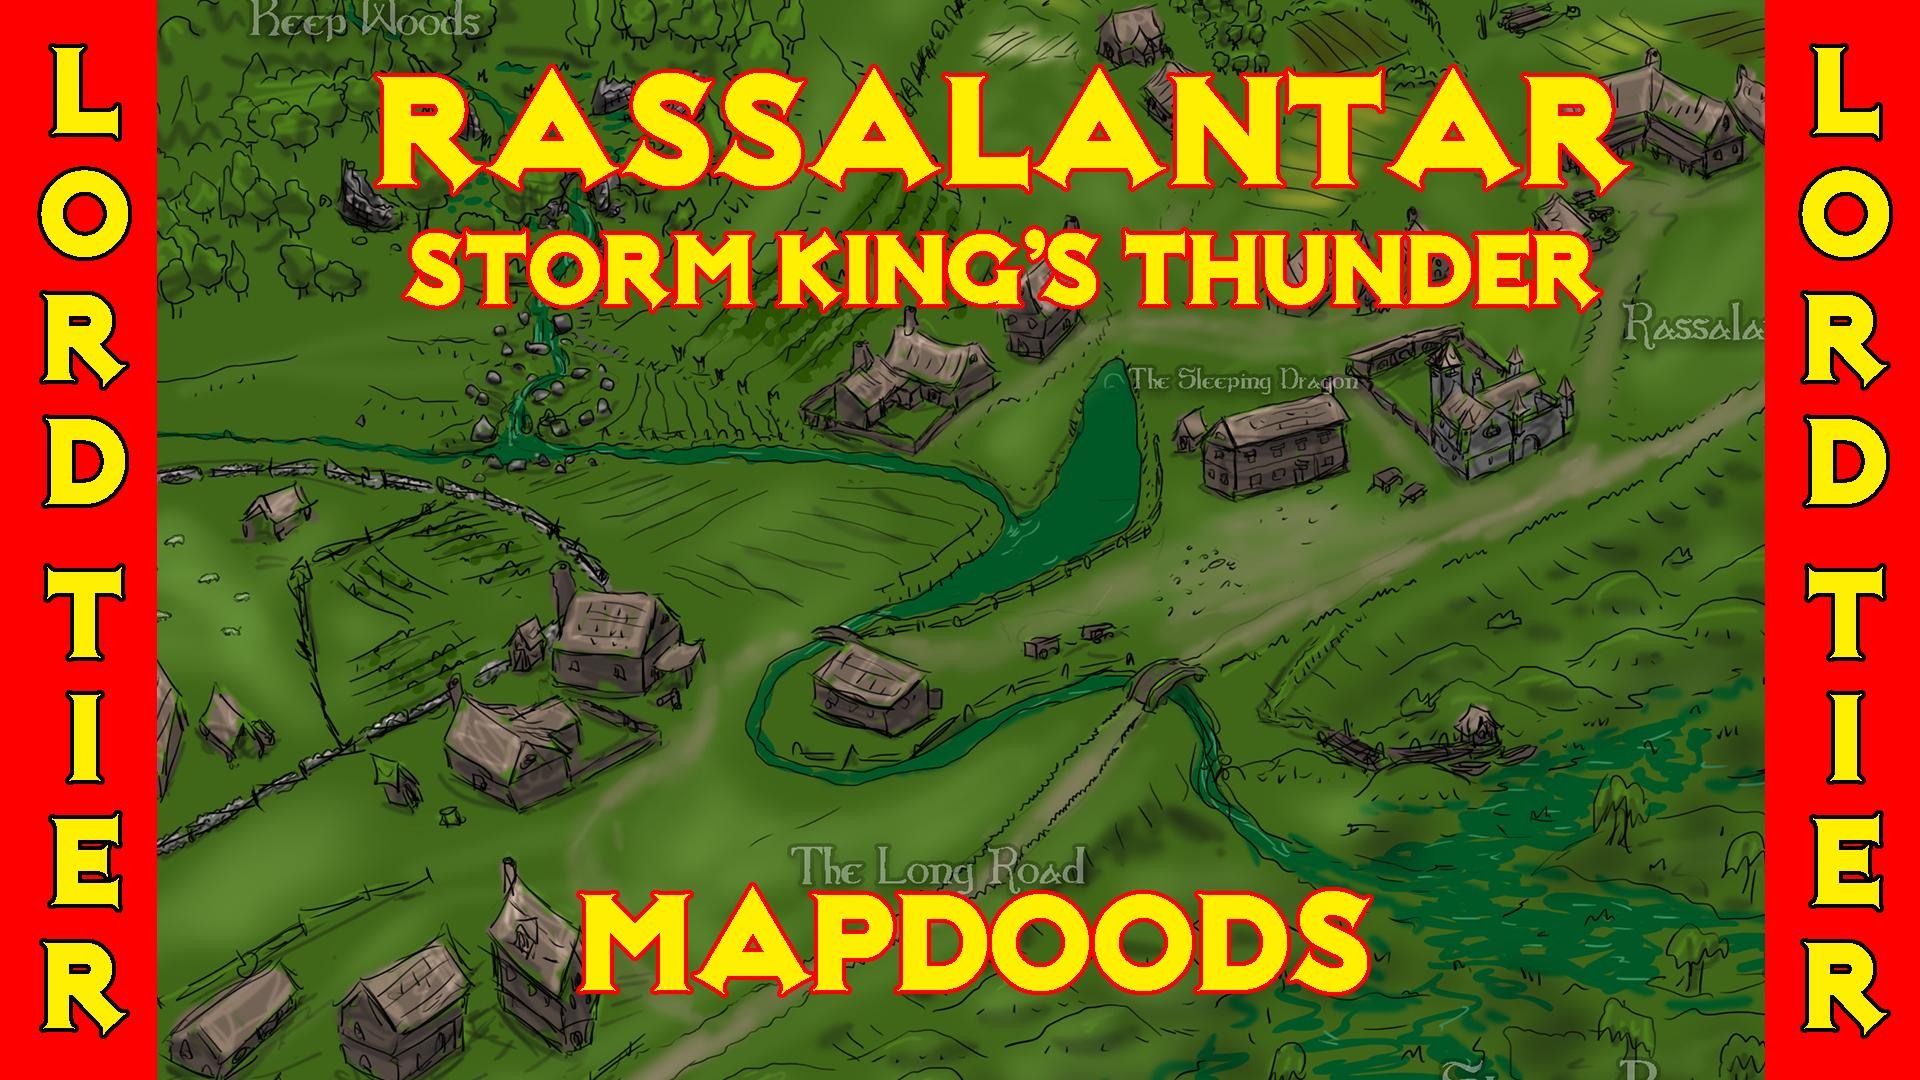 Mapdoods Rassalantar